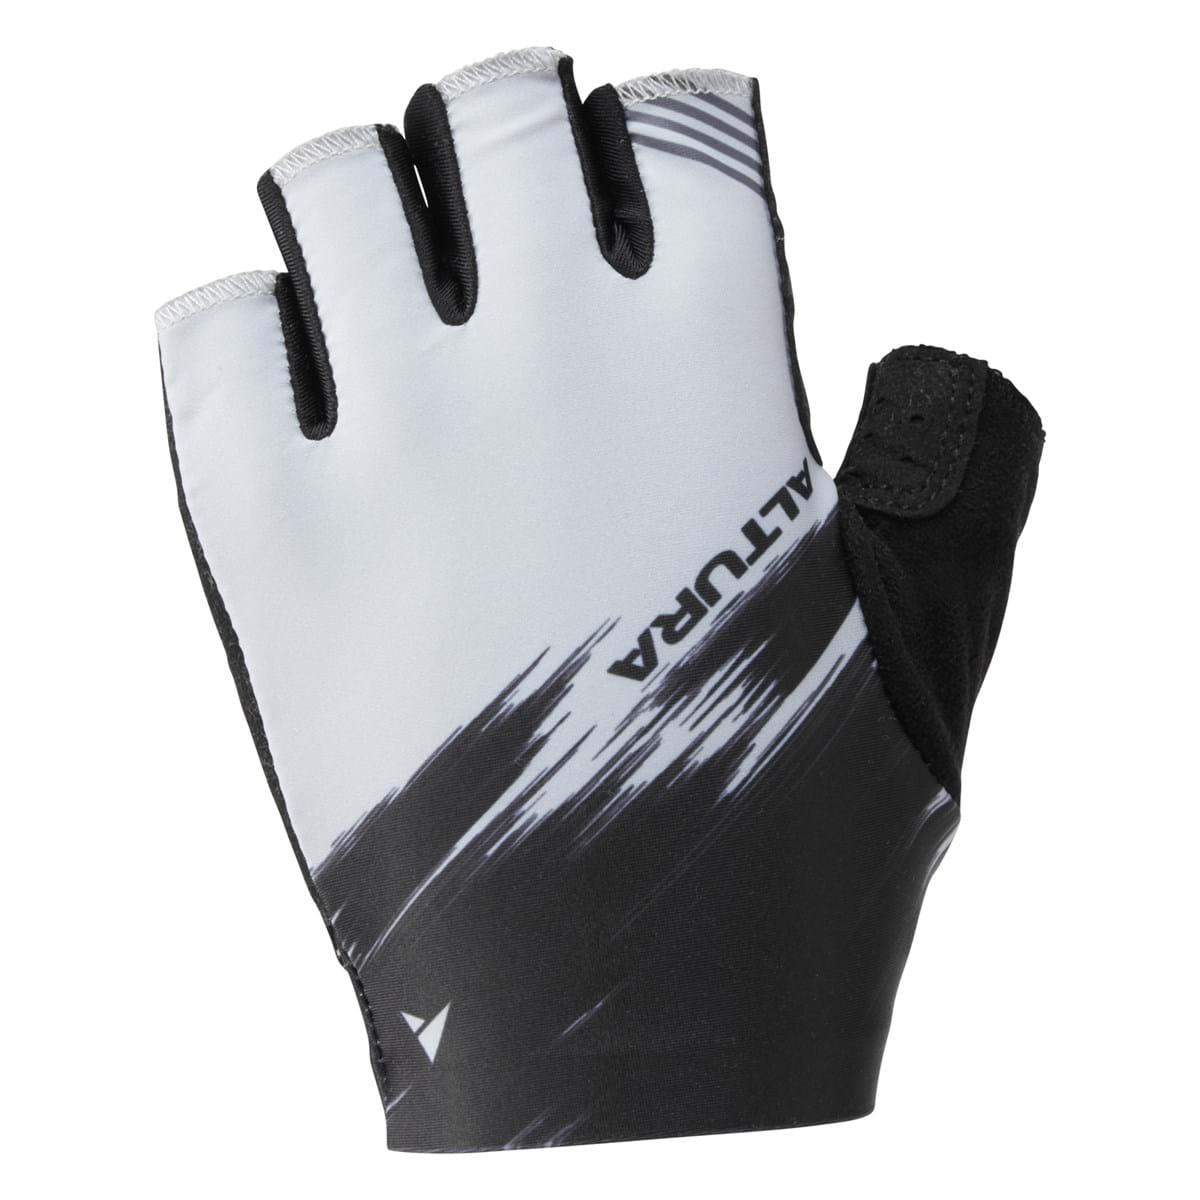 Altura Dryline 2 56l Pannier Pair Grey/black